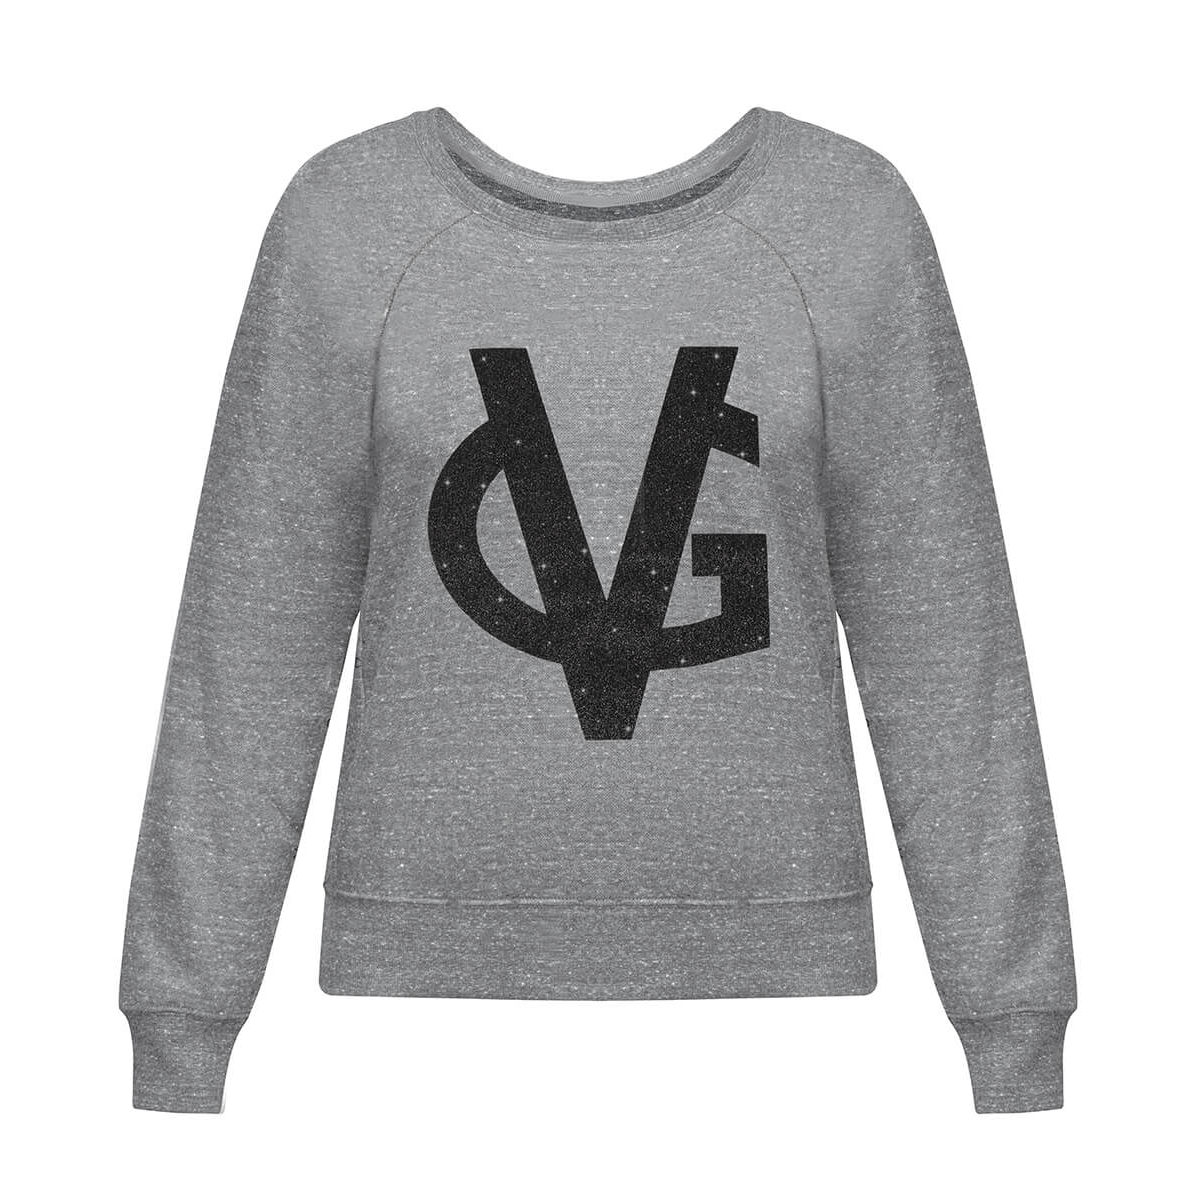 VG Felpa grigia & logo glitter nero